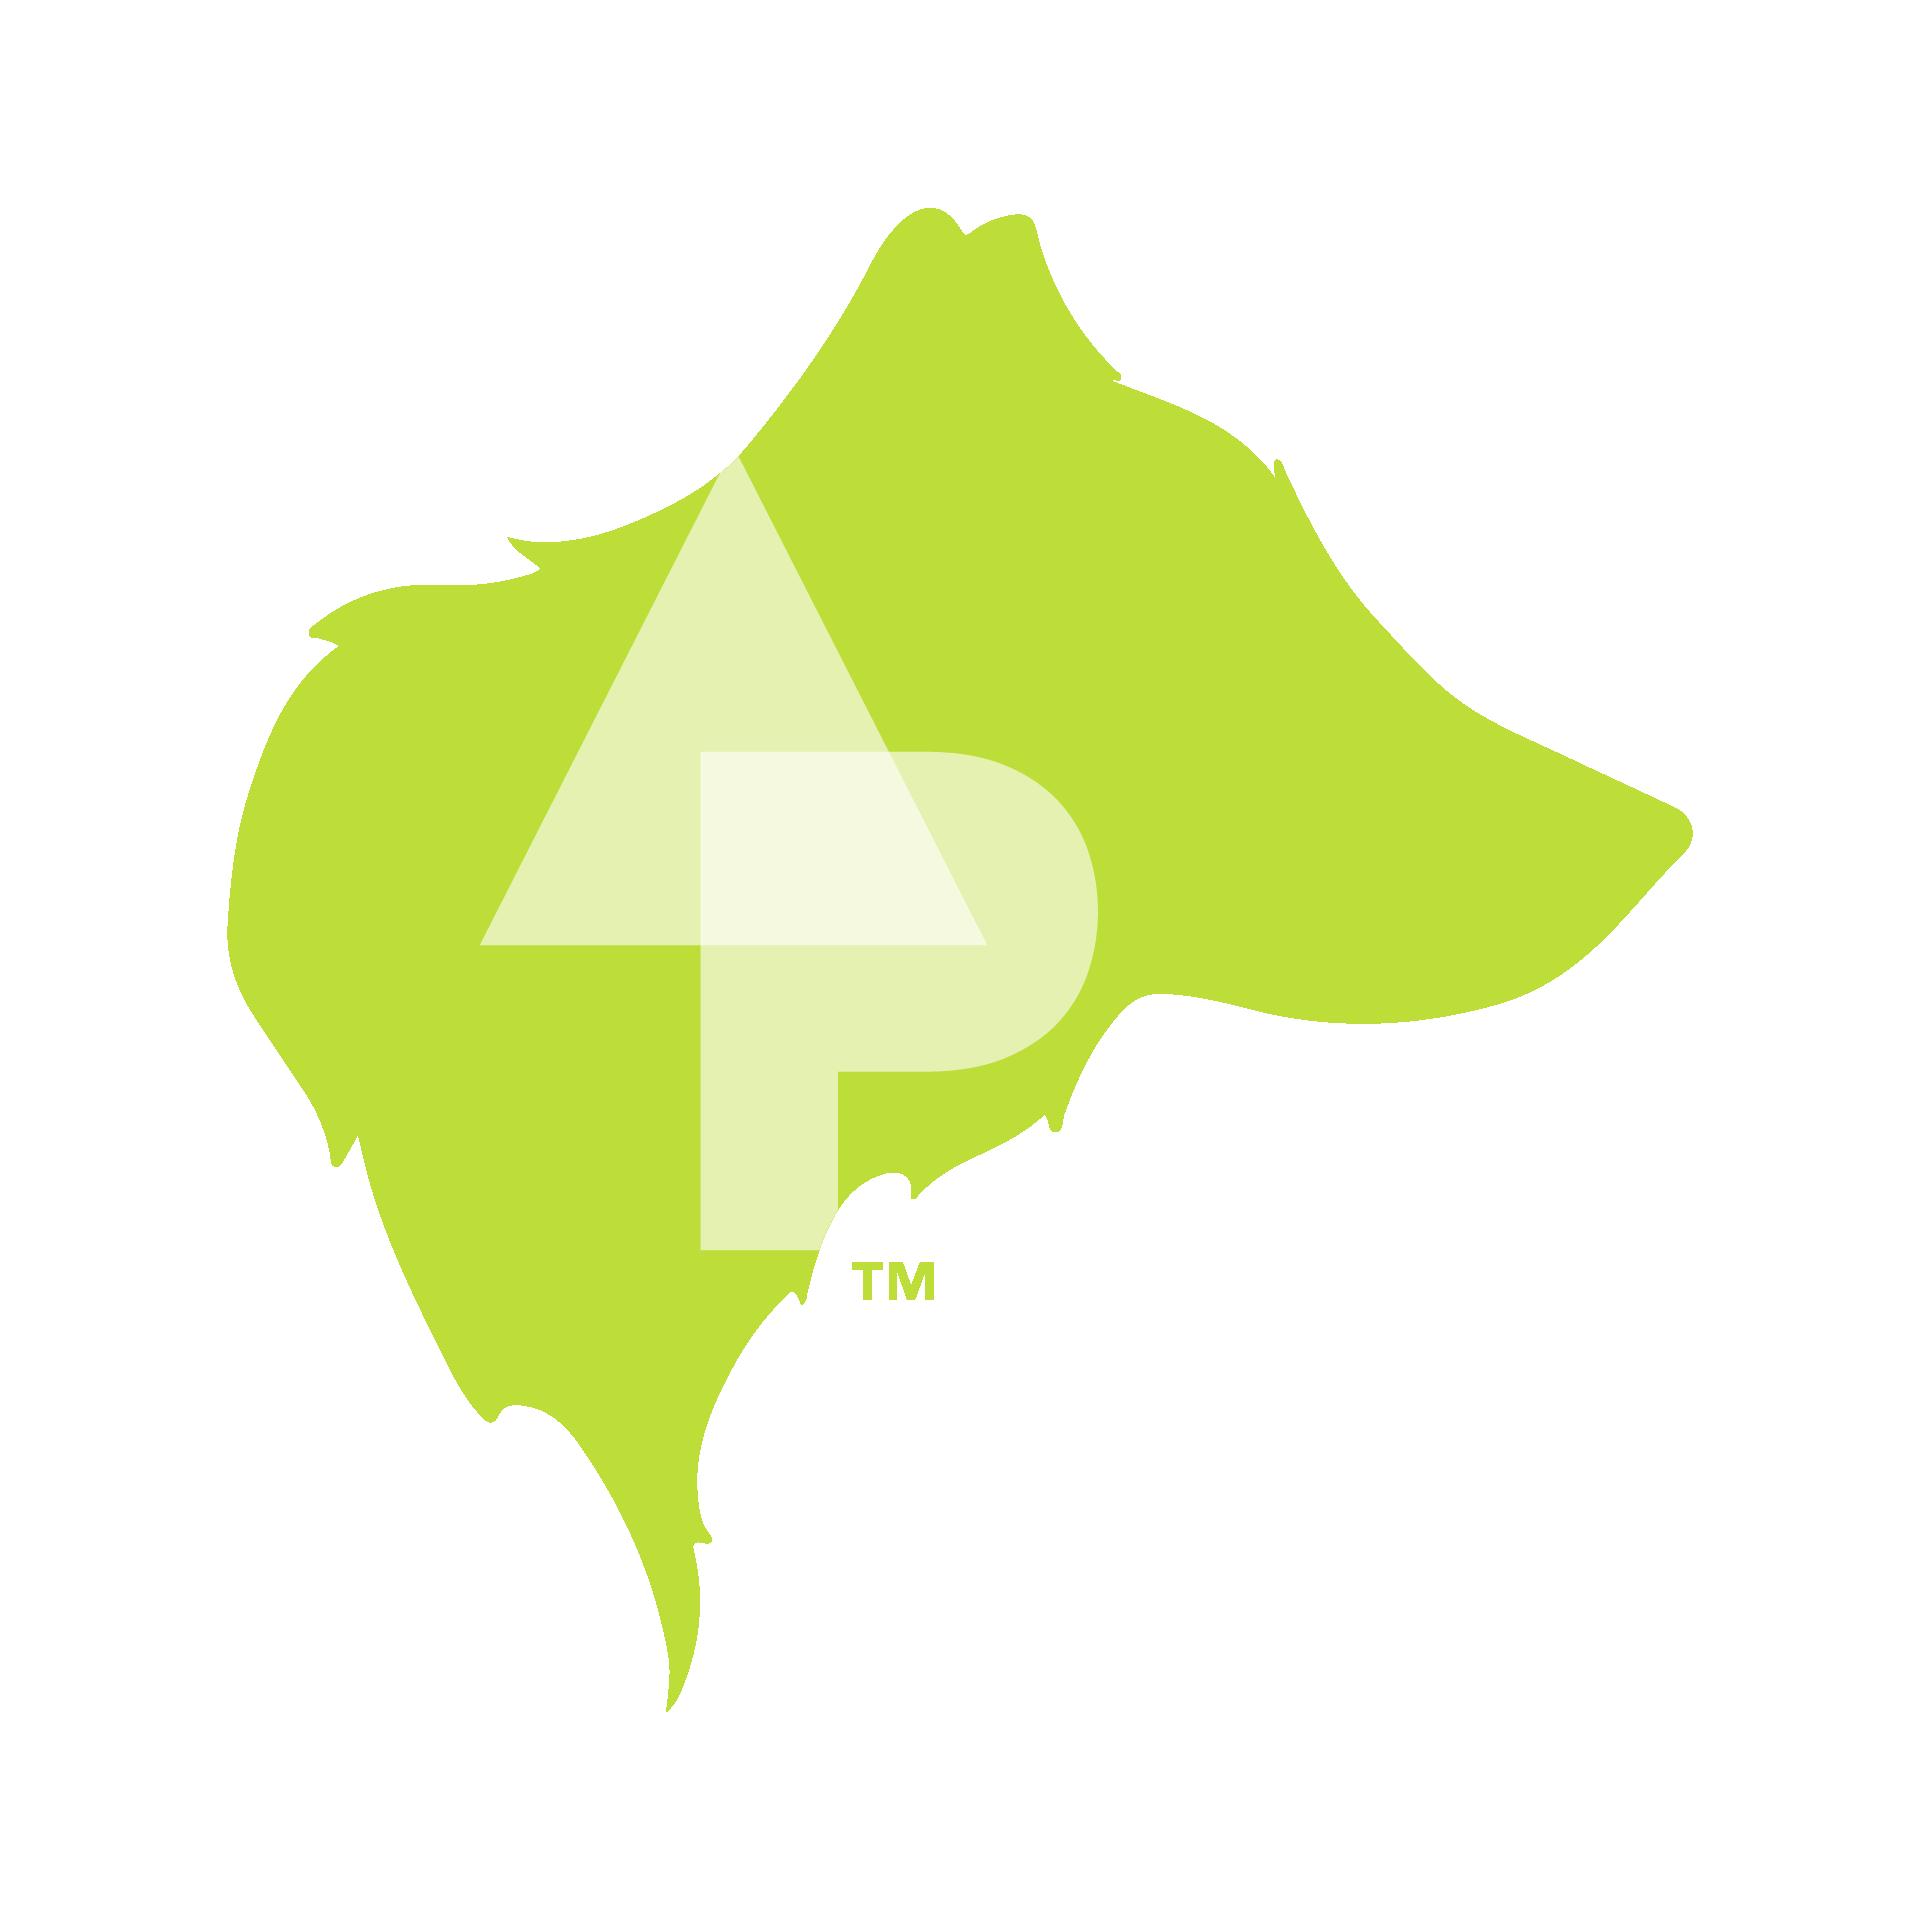 AthenaPack-2018Logo-WolfIconTM-Citron.png